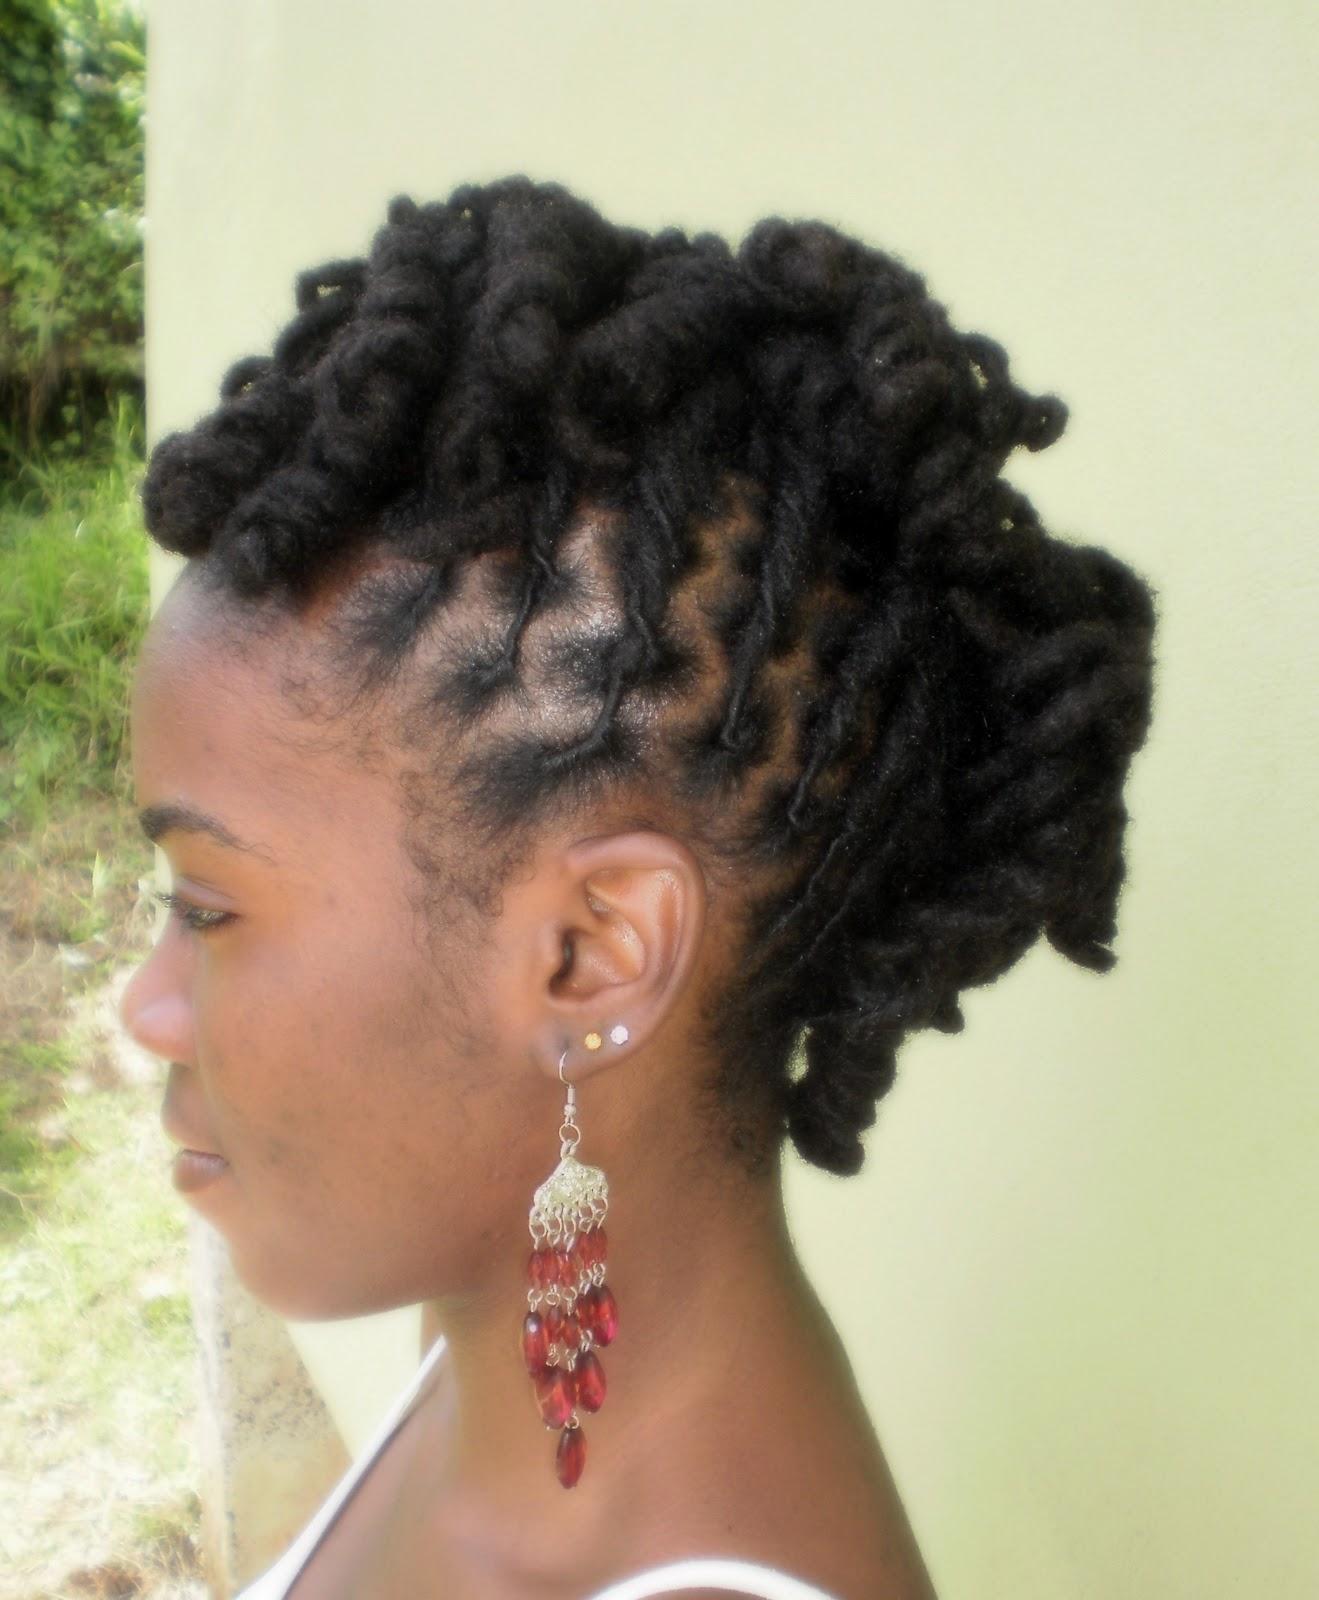 http://4.bp.blogspot.com/-3tDb5kT488k/TxK-BtTD6qI/AAAAAAAADqs/NYsbnHLKDzQ/s1600/cabelo-negro-afro-morenas-inspiracao-ideias-estilos-cortes-penteados-dread-trancas-prontocortei-cabelos-6.jpg